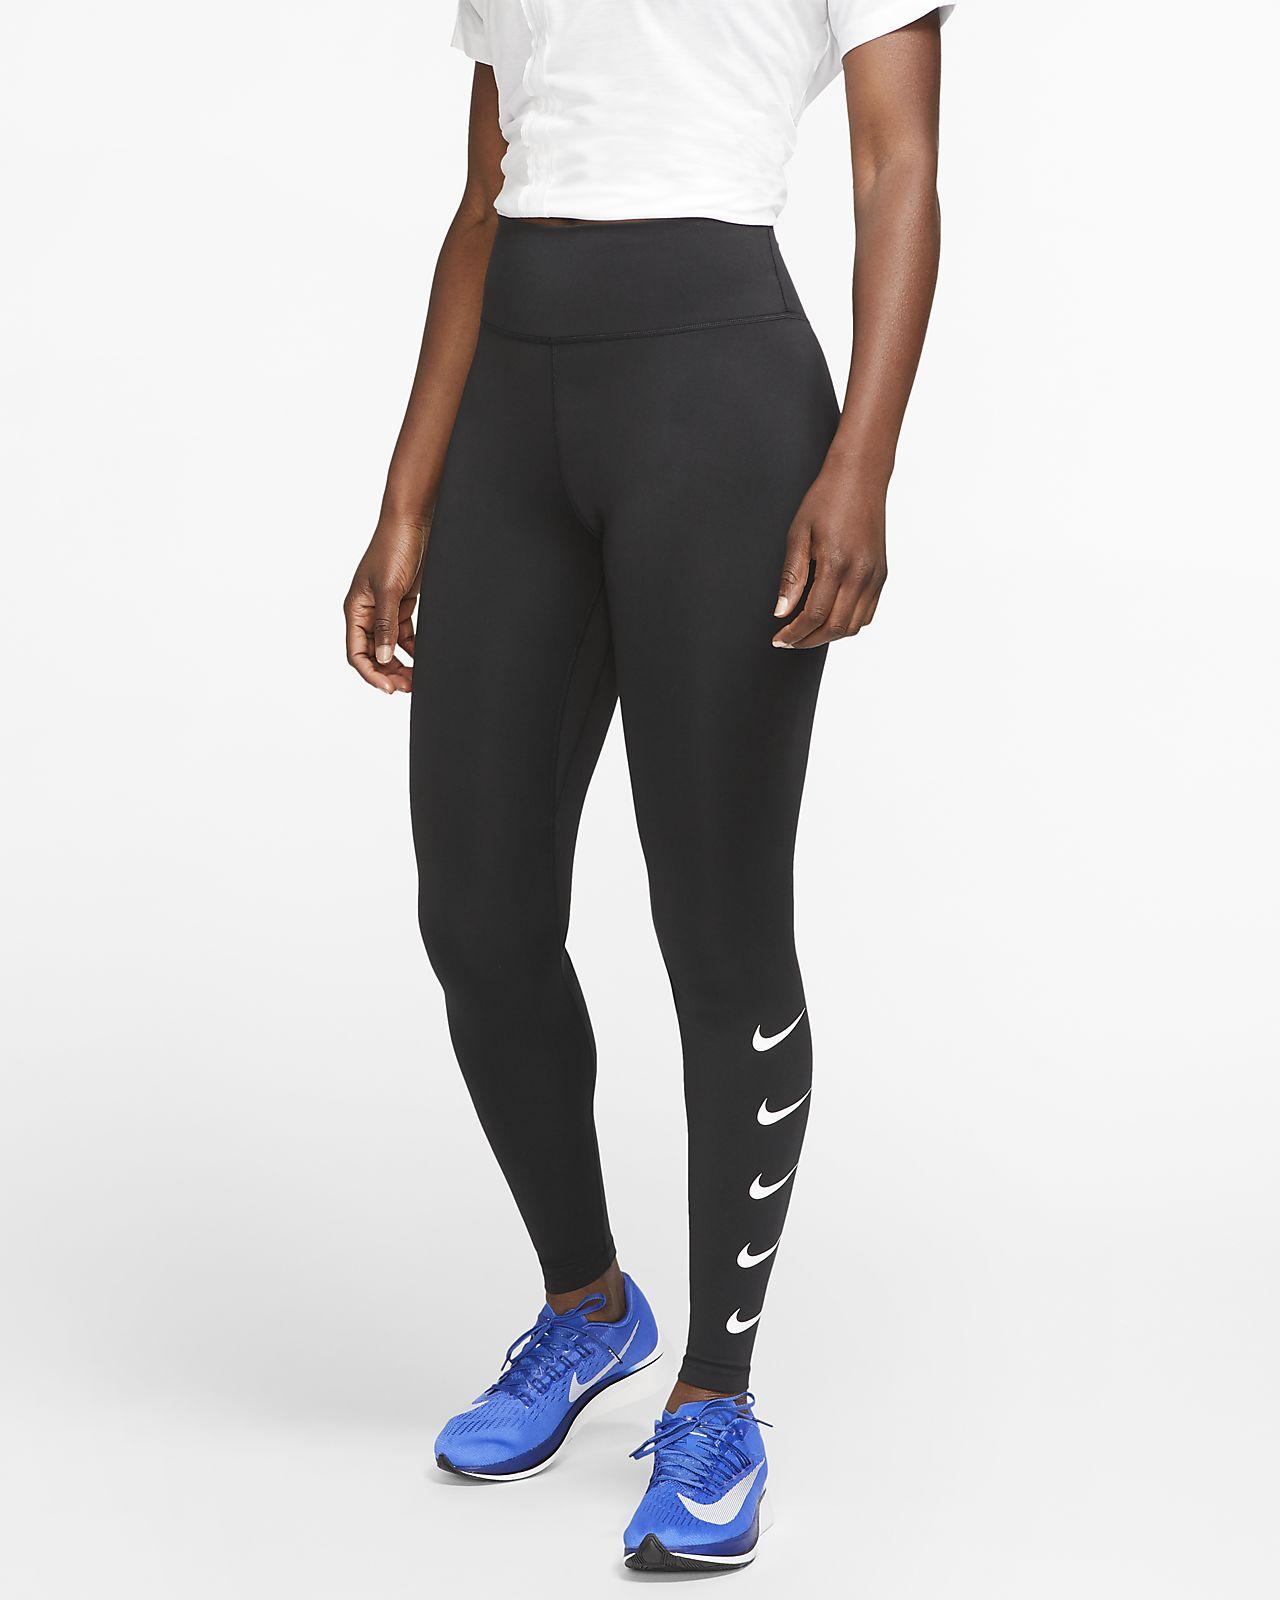 Nike Swoosh Women's Running Leggings